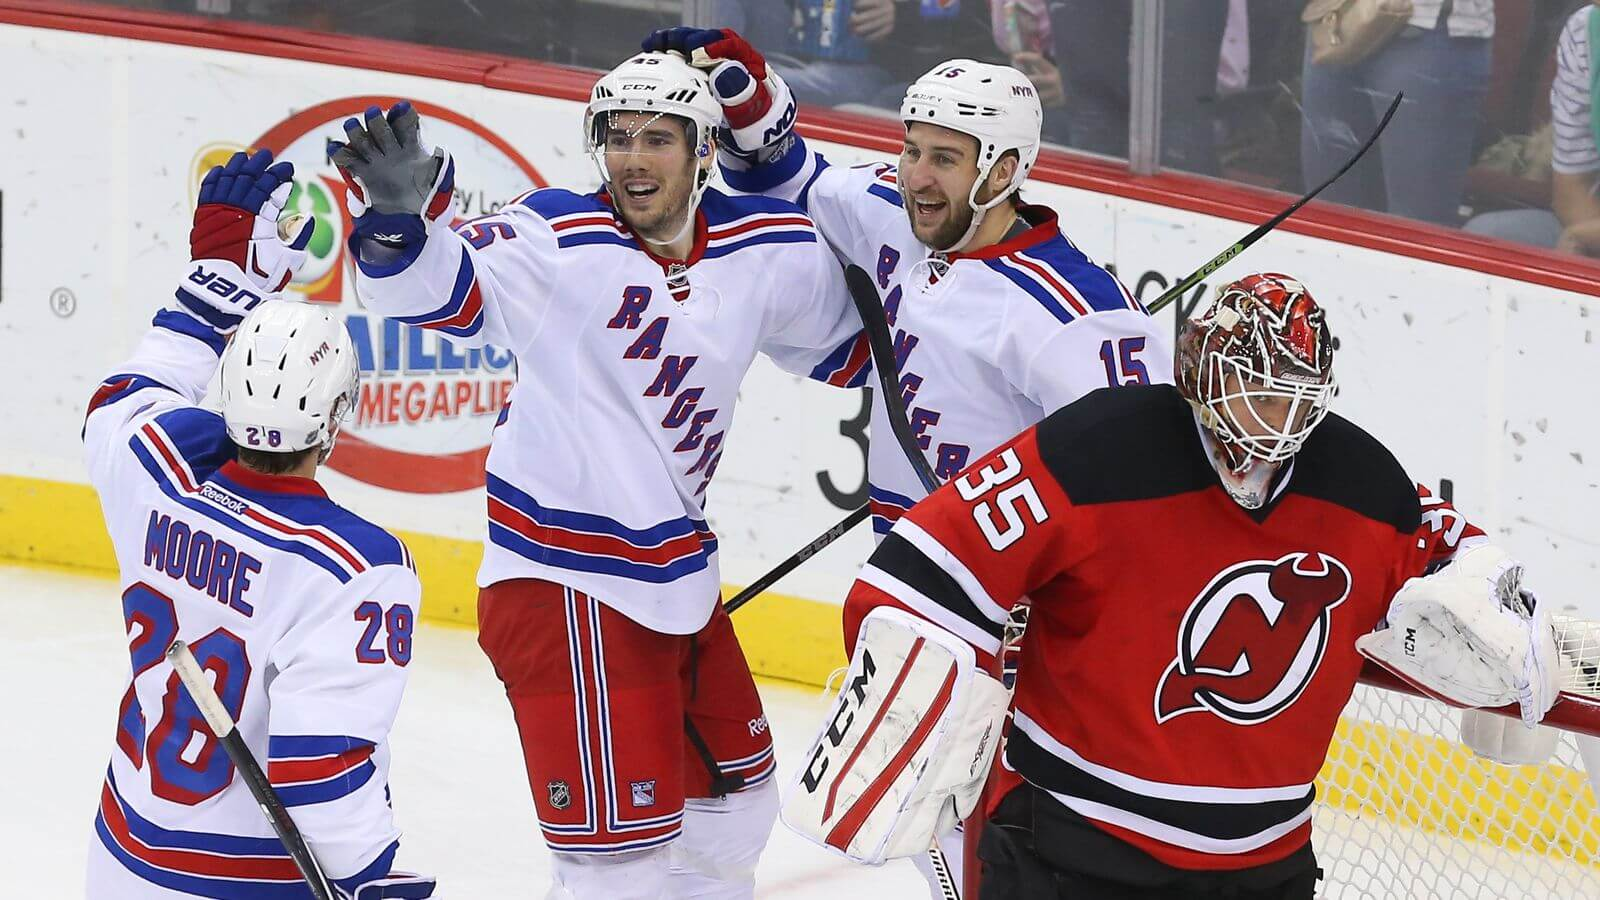 Нью-Джерси — Рейнджерс. Прогноз на матч. 18.04.2021. НХЛ. Регулярный сезон